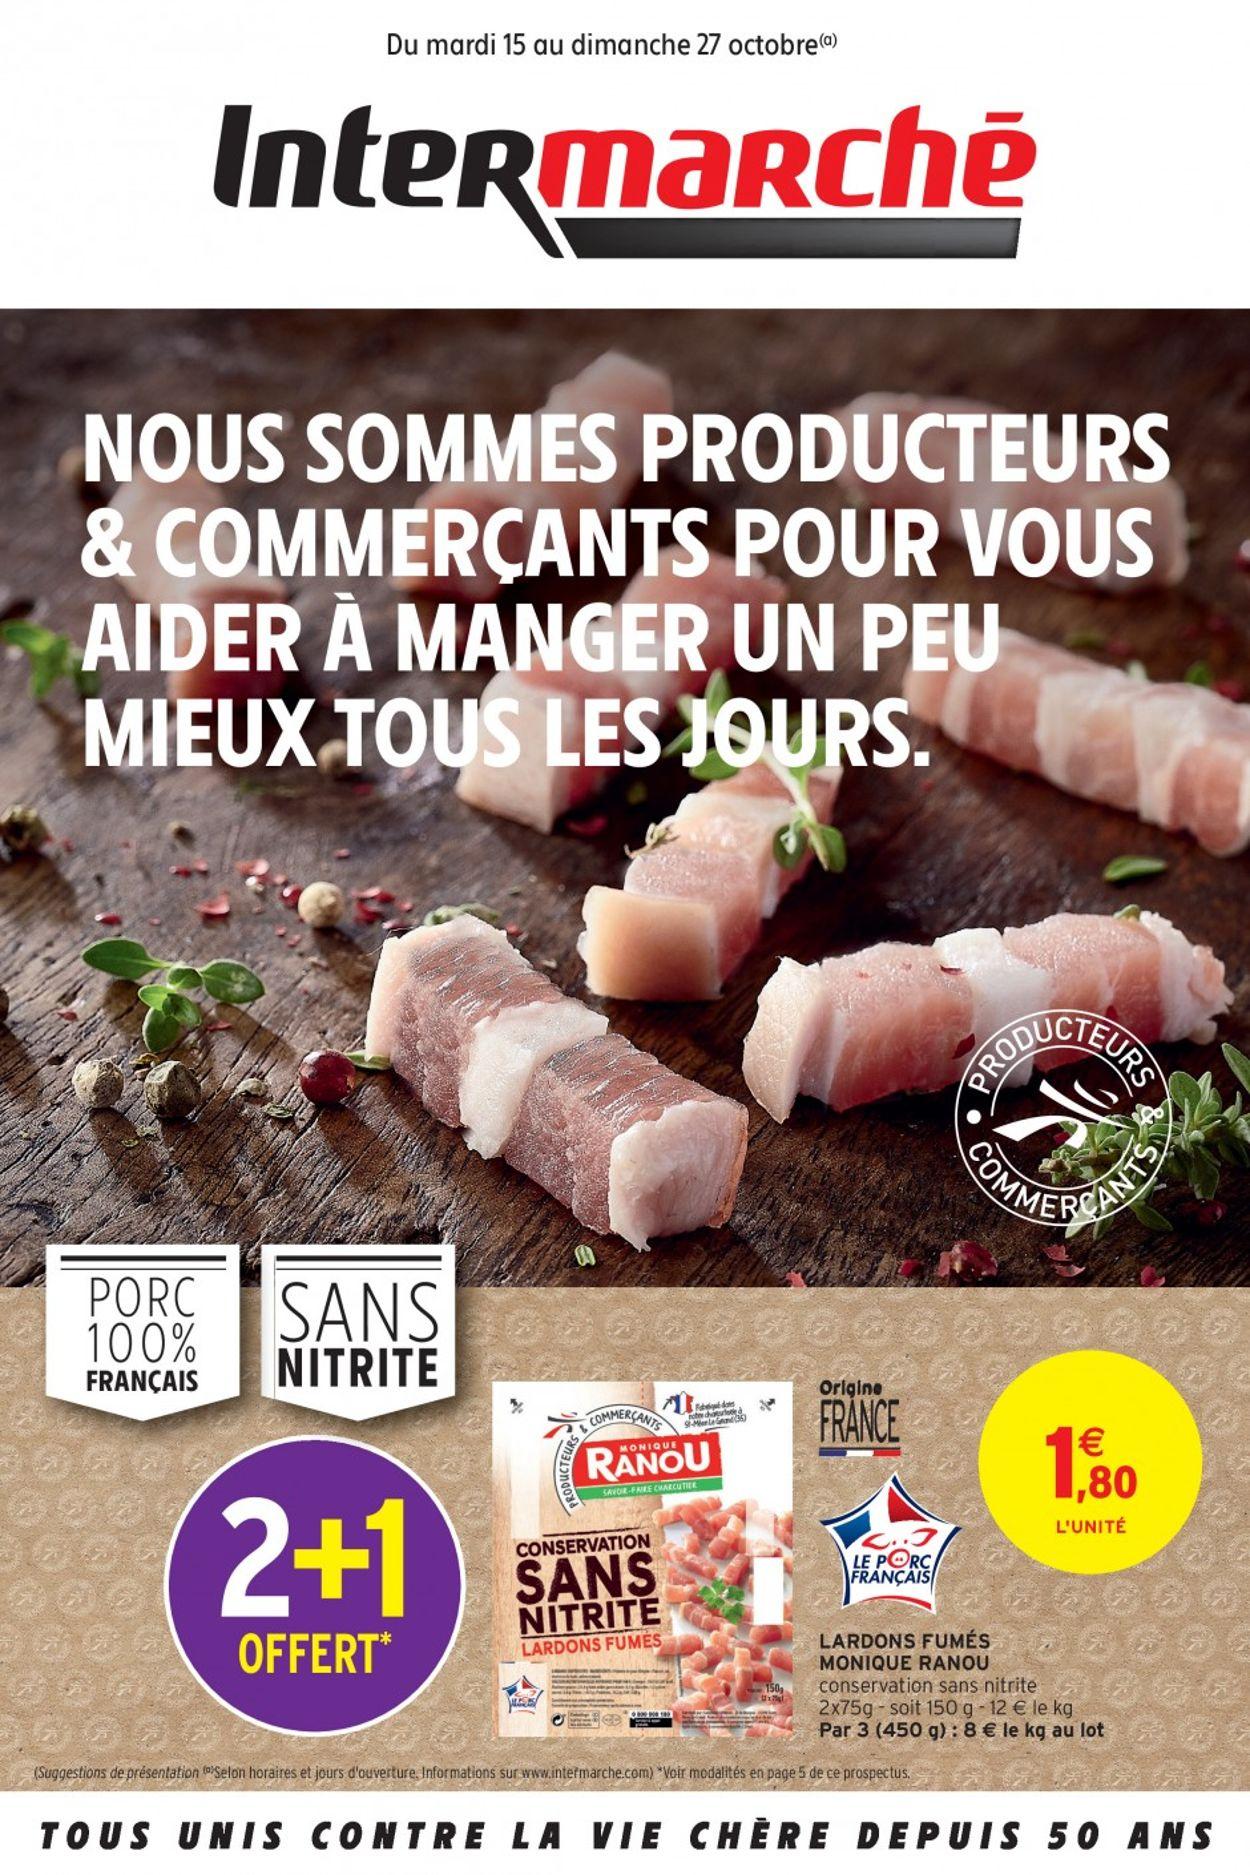 Intermarché Catalogue - 15.10-27.10.2019